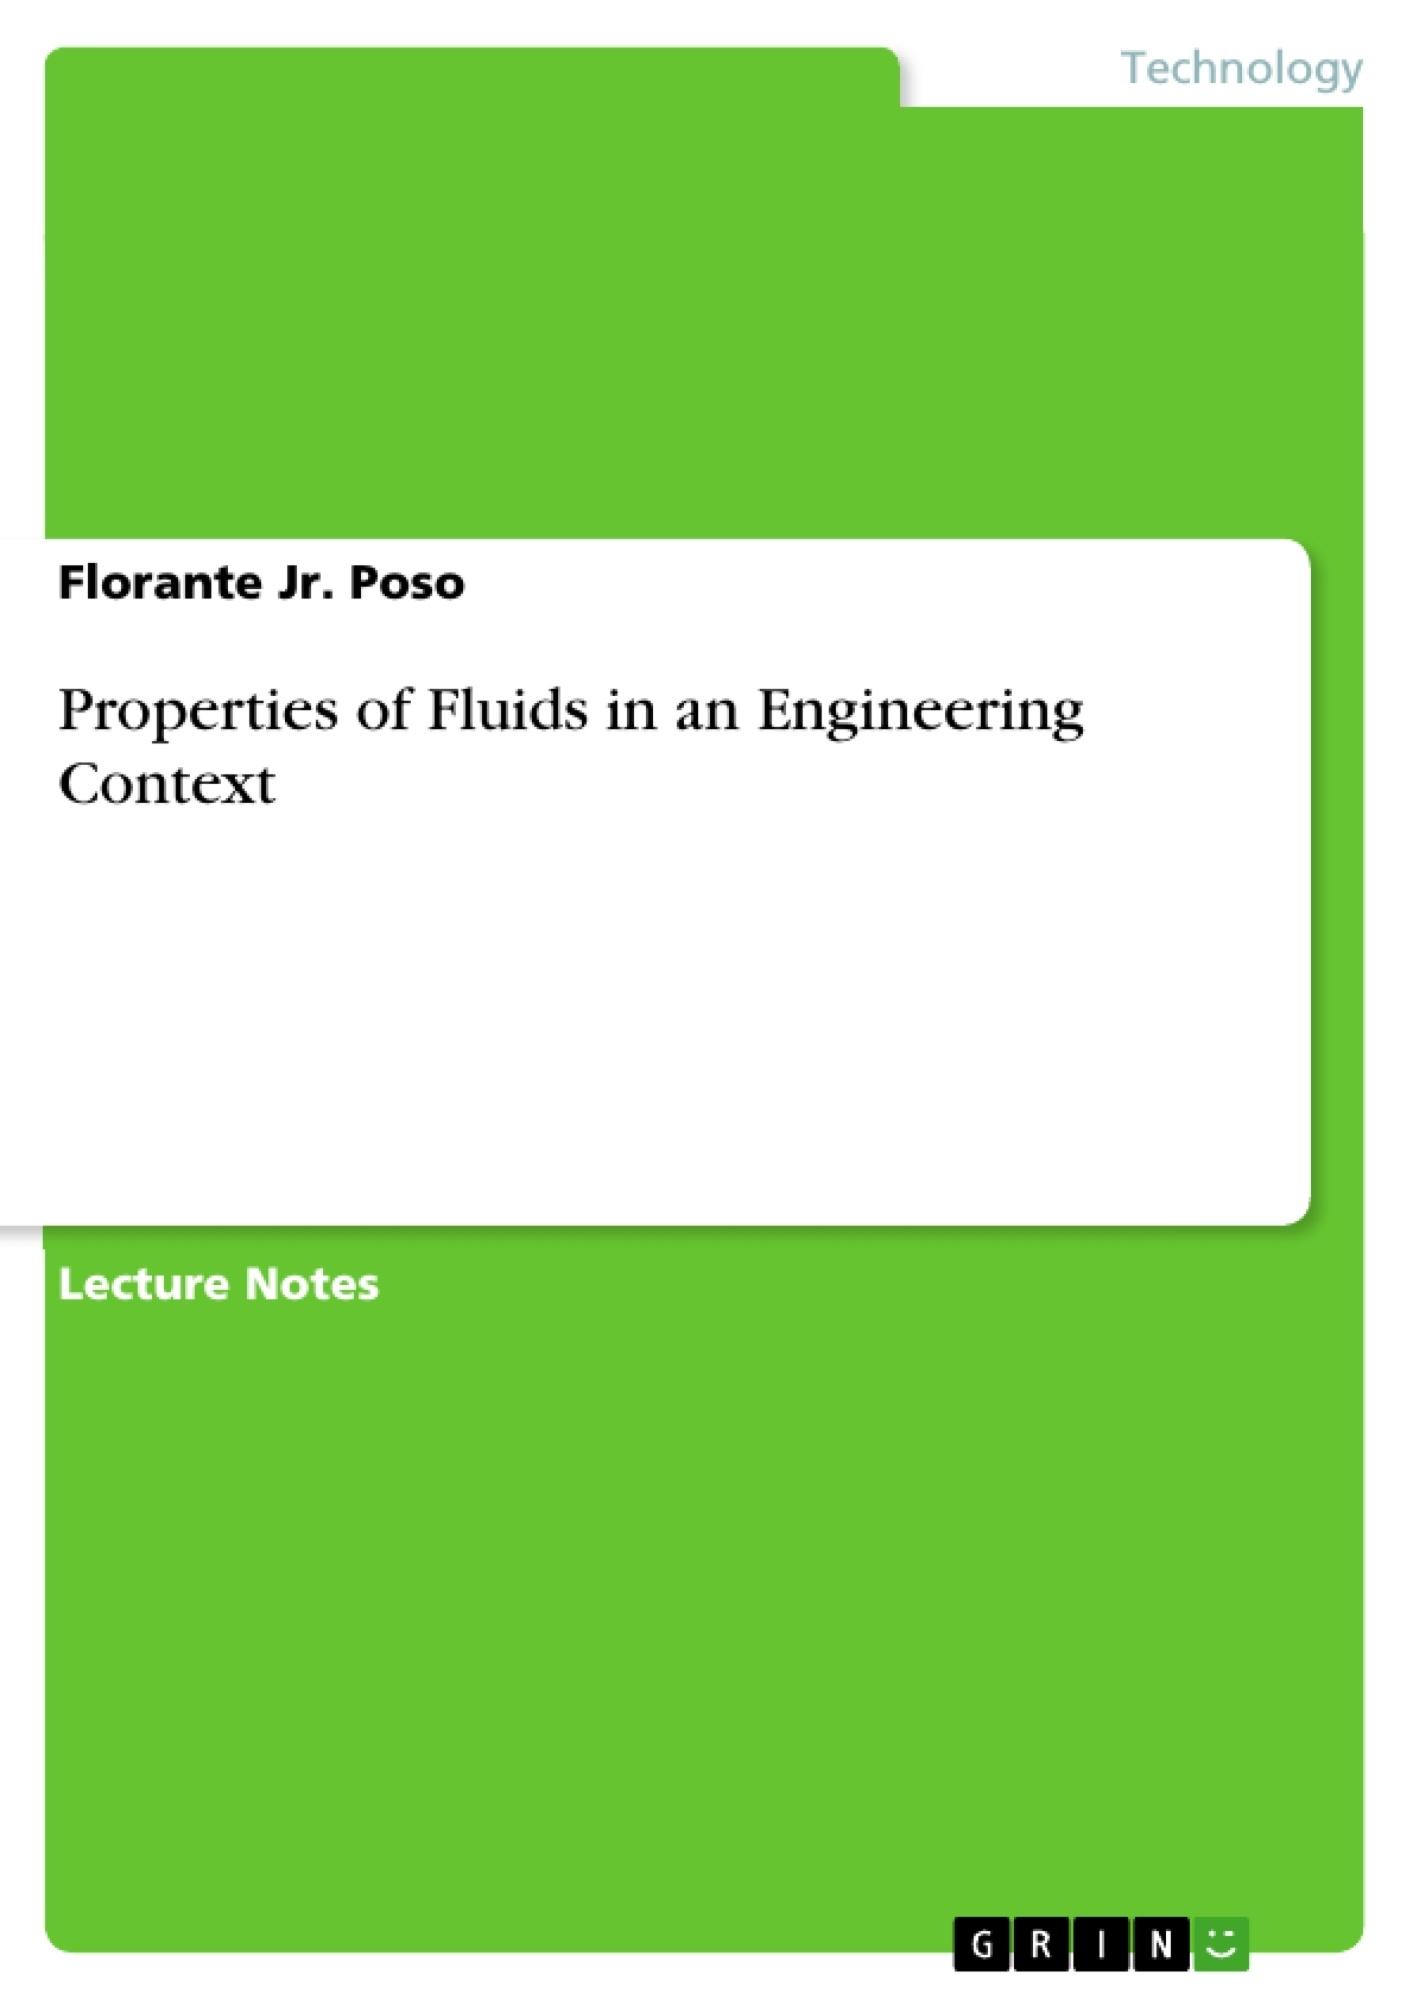 Title: Properties of Fluids in an Engineering Context